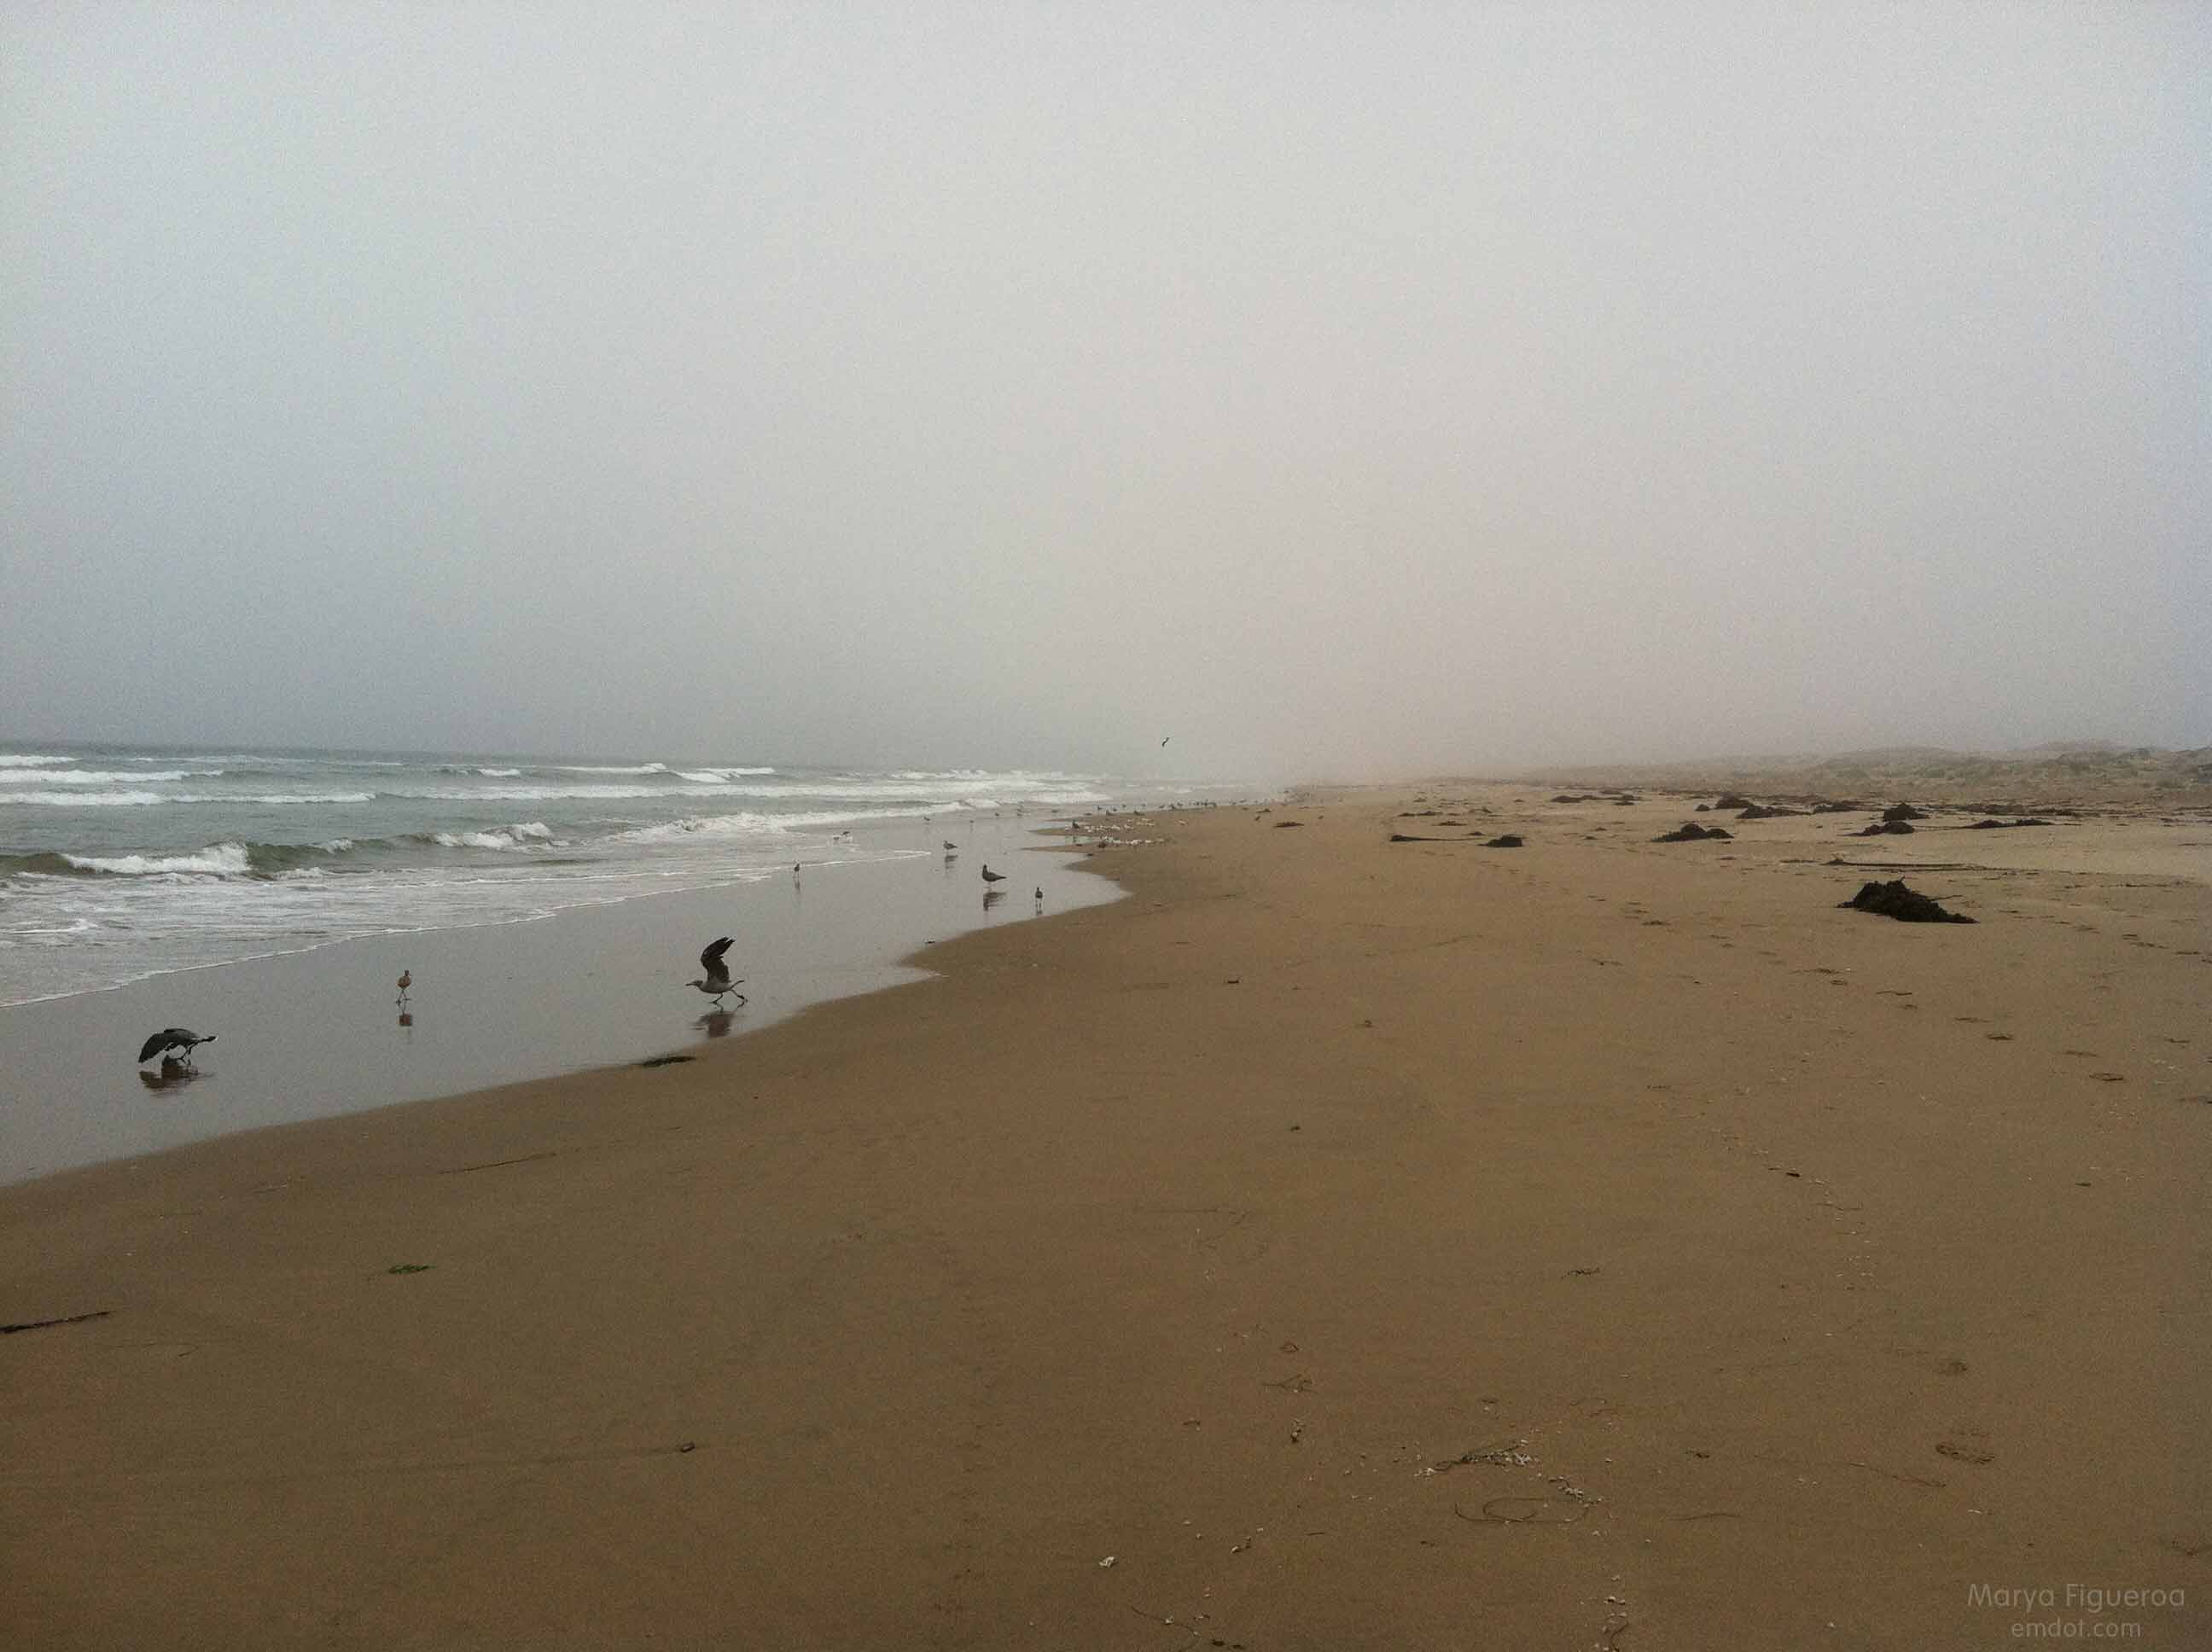 sandspit_081713_1birds